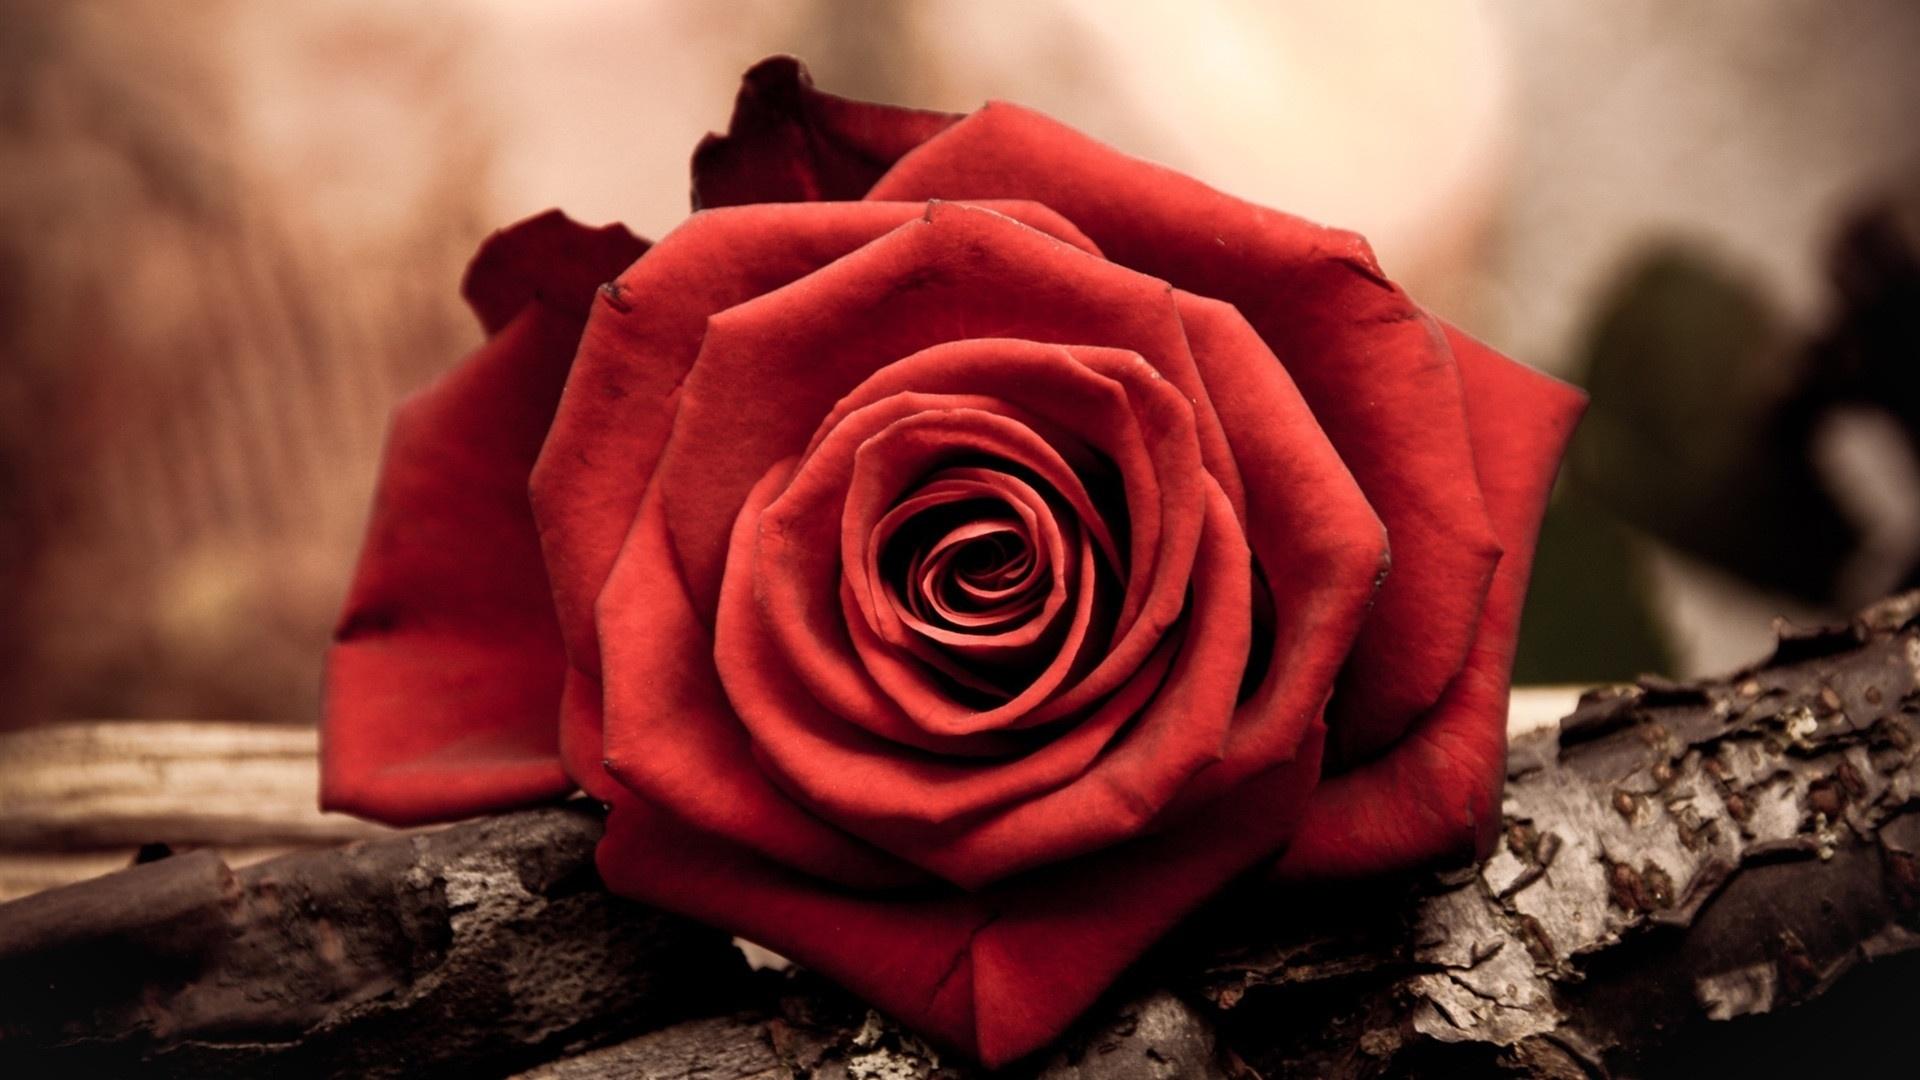 Red Flower PC Wallpaper HD